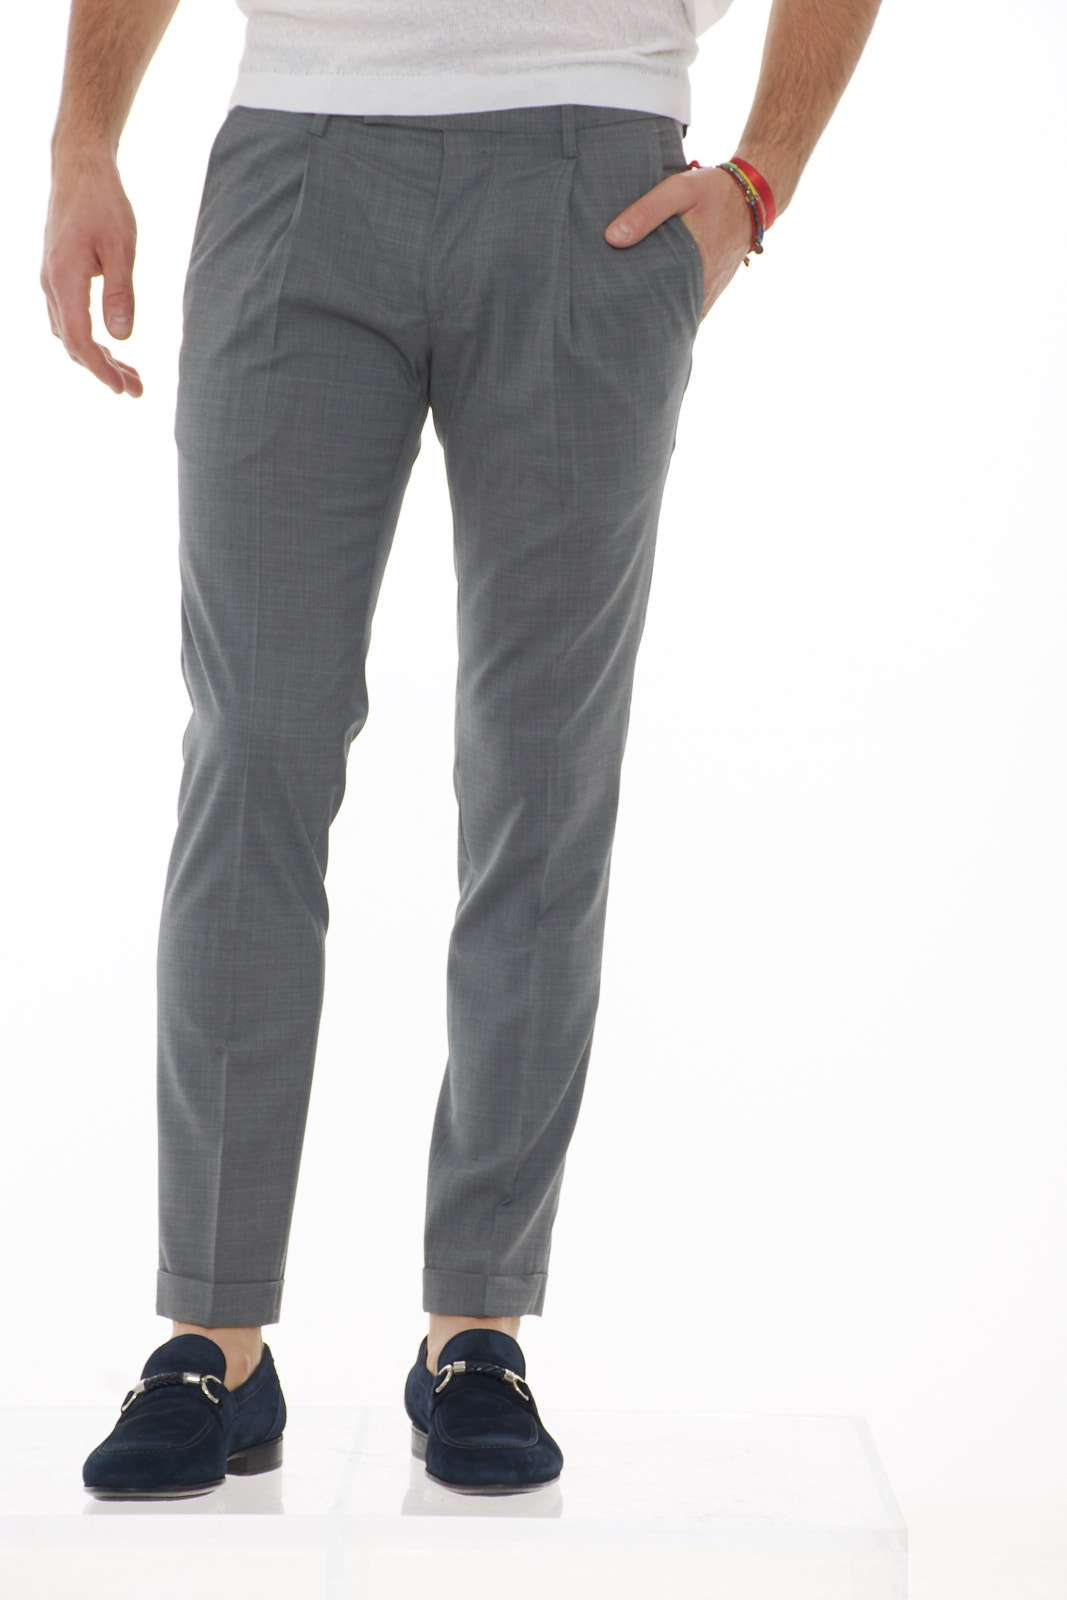 https://www.parmax.com/media/catalog/product/a/i/PE-outlet_parmax-pantaloni-uomo-Michael-Coal-FREDERICK3343-A.jpg